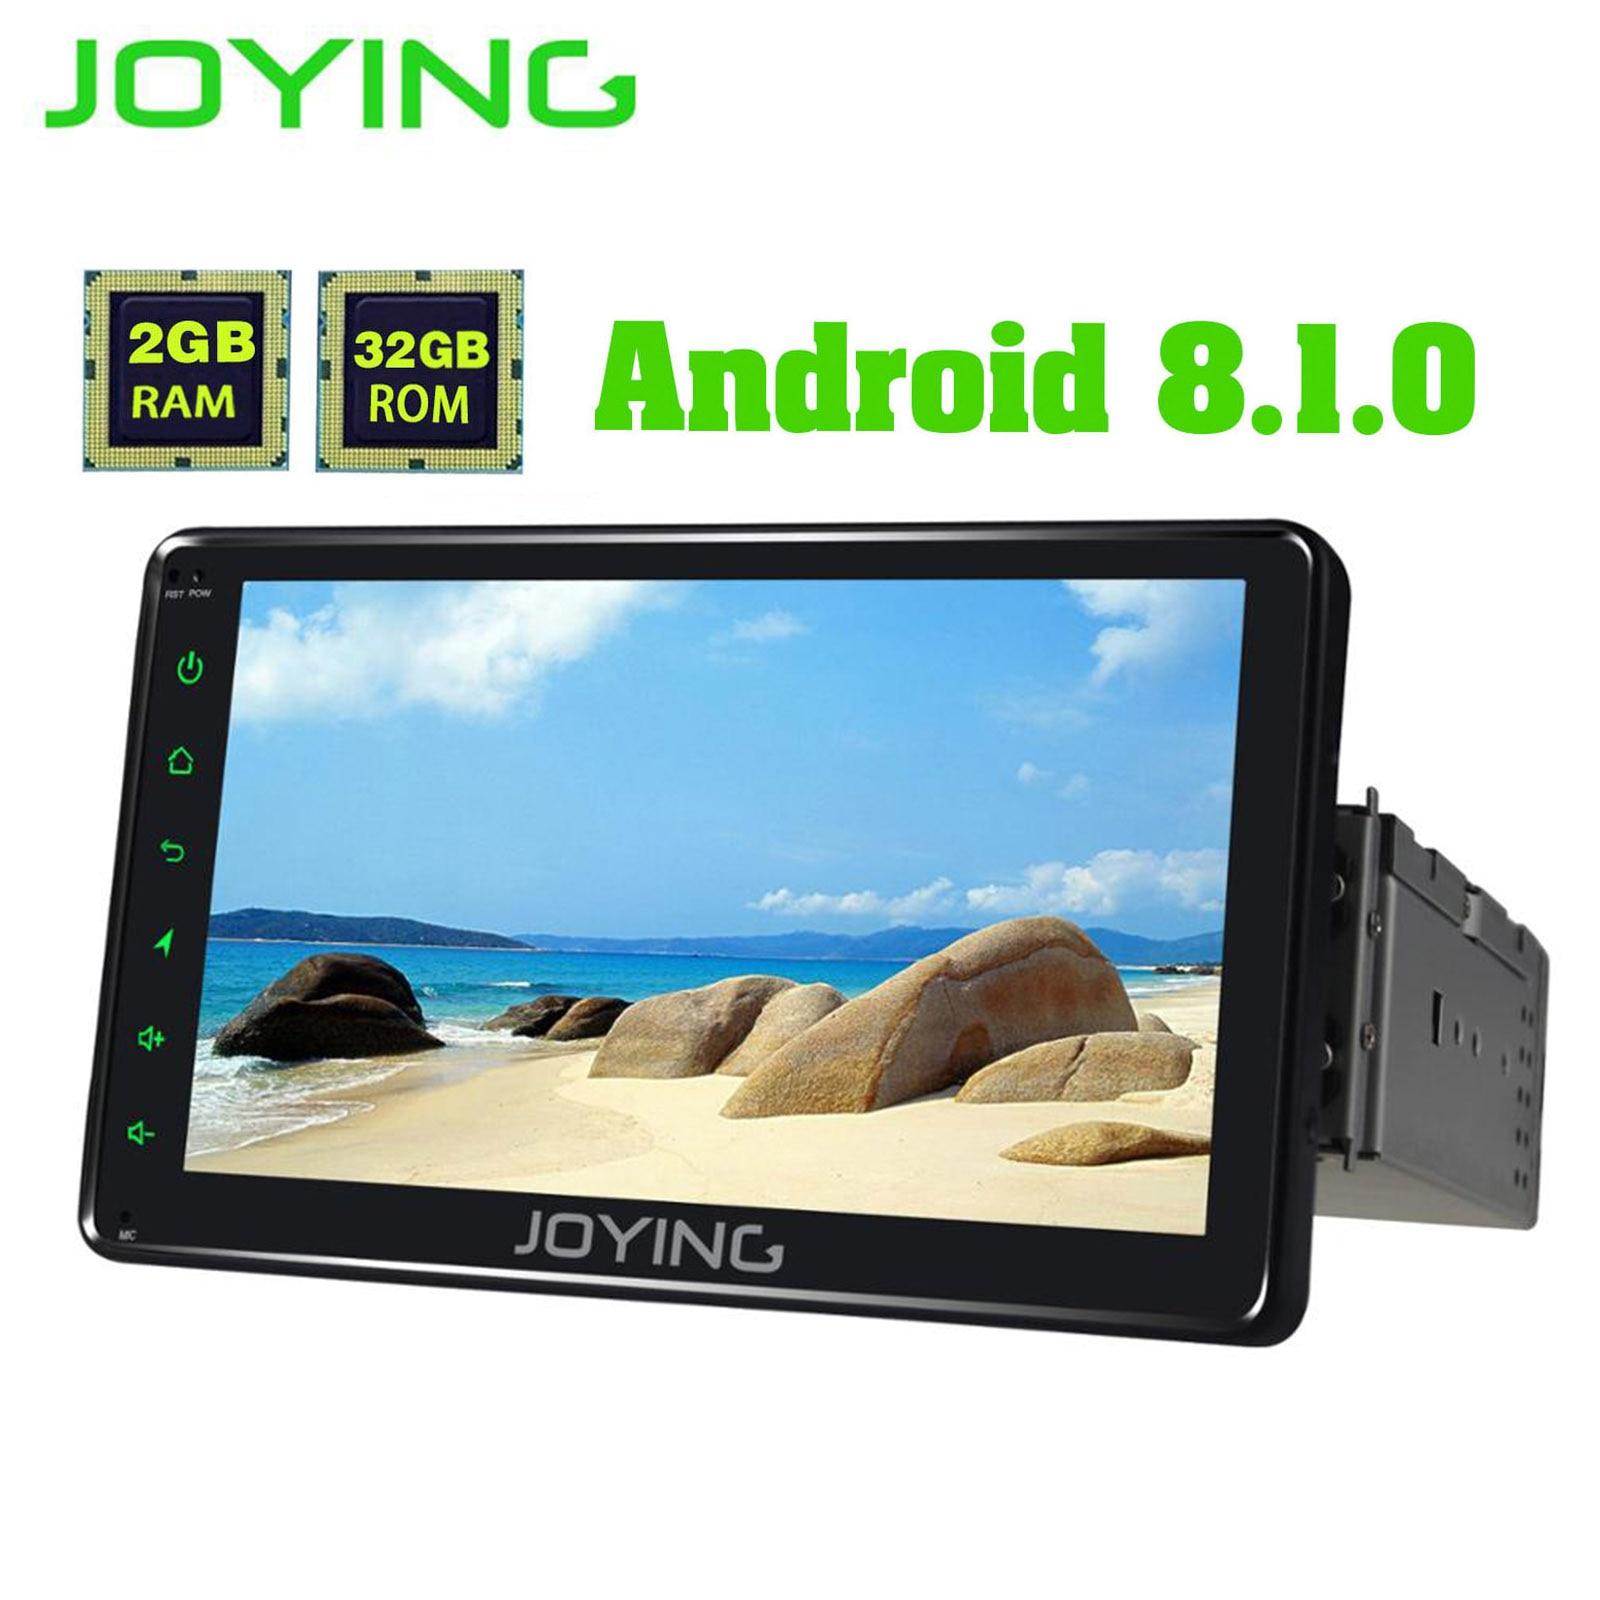 JOYING 2GB RAM Android 8.1 Car Autoradio 1 Single DIN 7'' Head Unit HD Multimedia Stereo Car Radio Player Bluetooth FM WIFI DVR-in Car Multimedia Player from Automobiles & Motorcycles    2